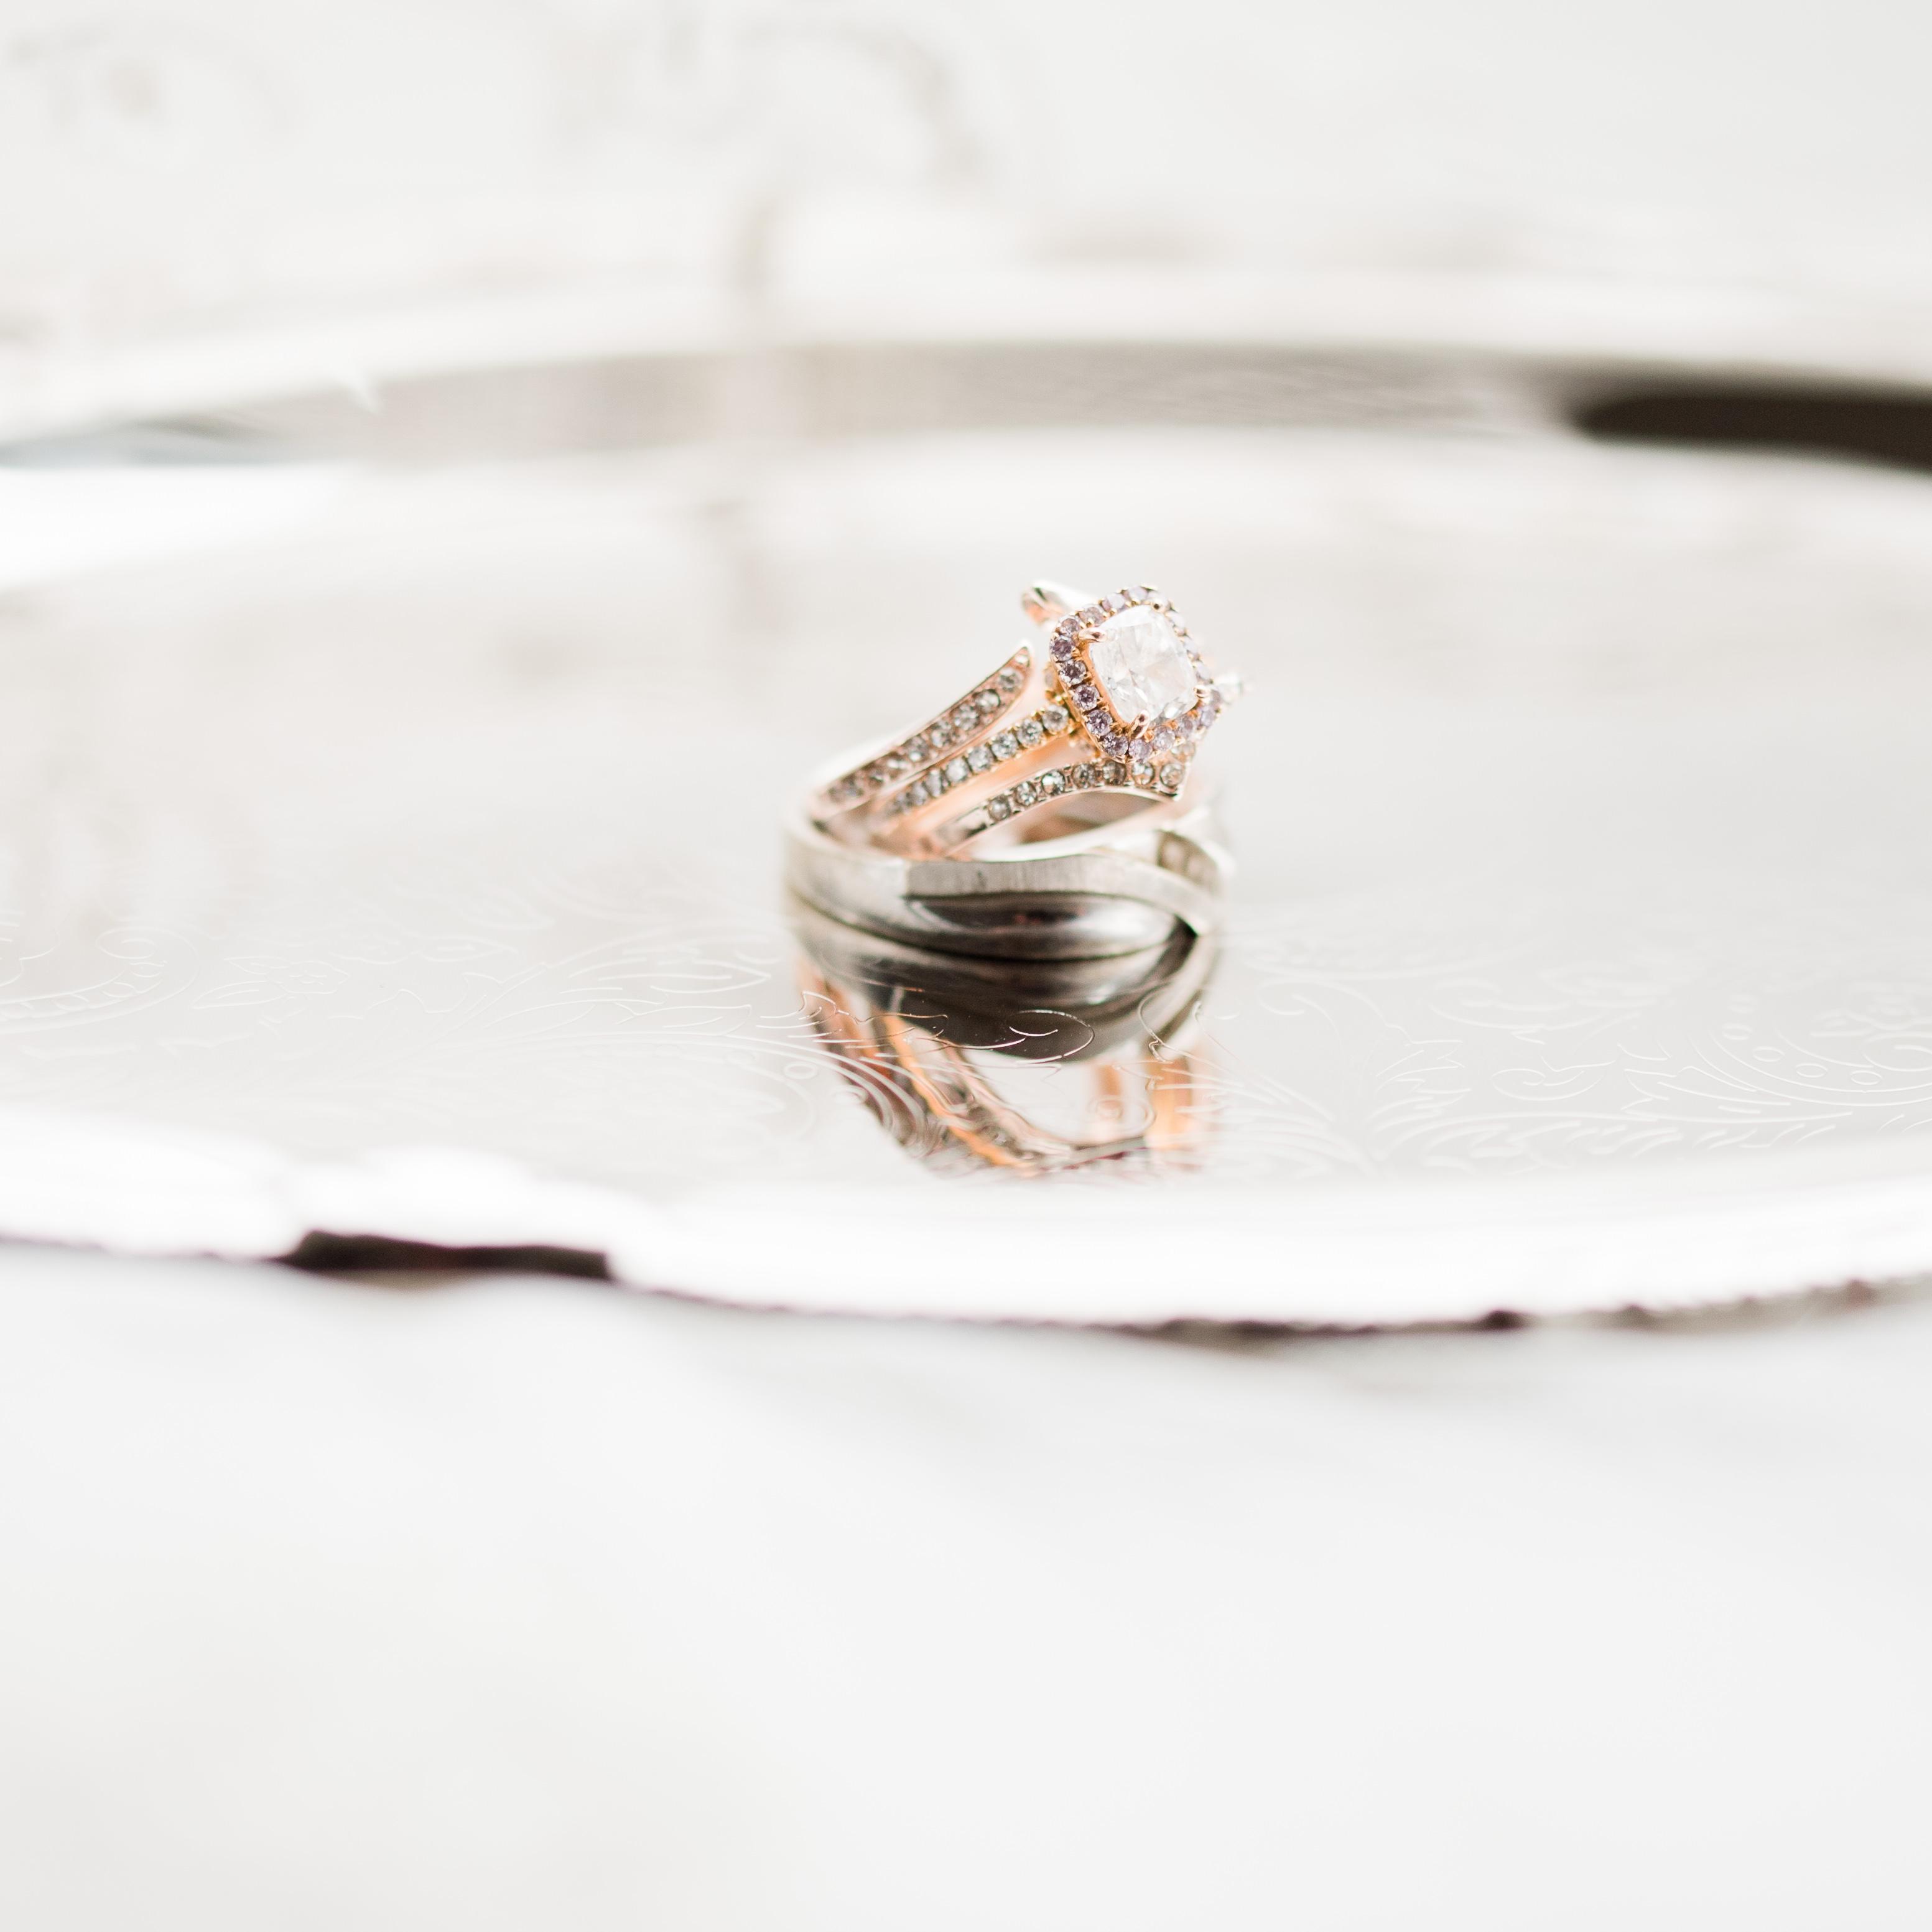 rose gold wedding ring, rose gold engagement ring, wedding photographer near Gibbet Hill, Groton, MA, Boston photographer